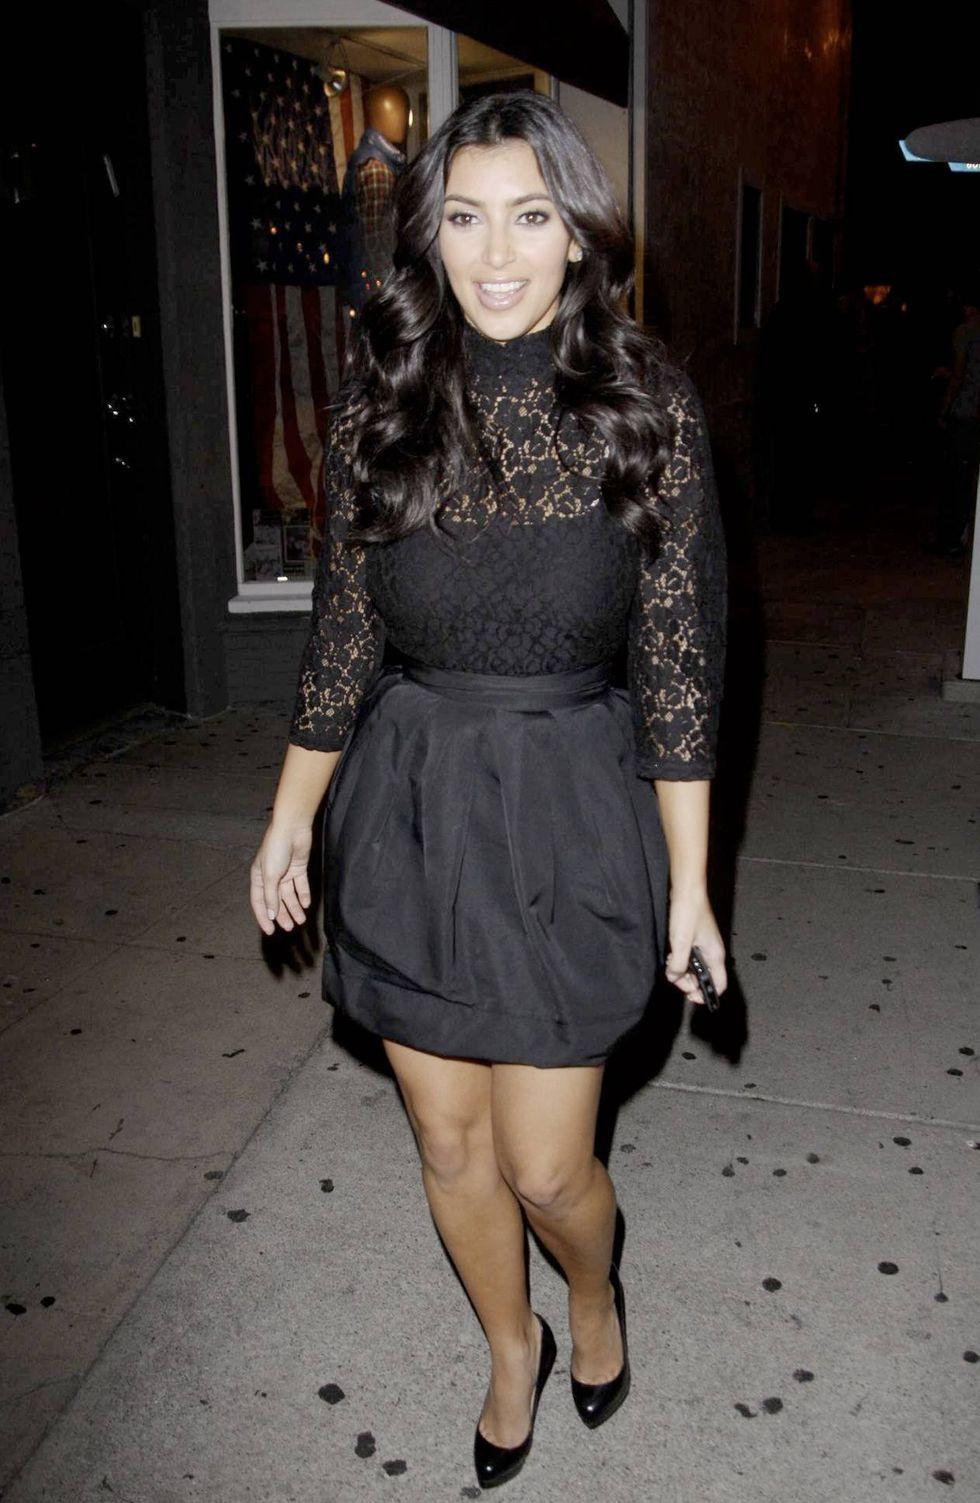 kim-kardashian-at-villa-nightclub-in-los-angeles-01